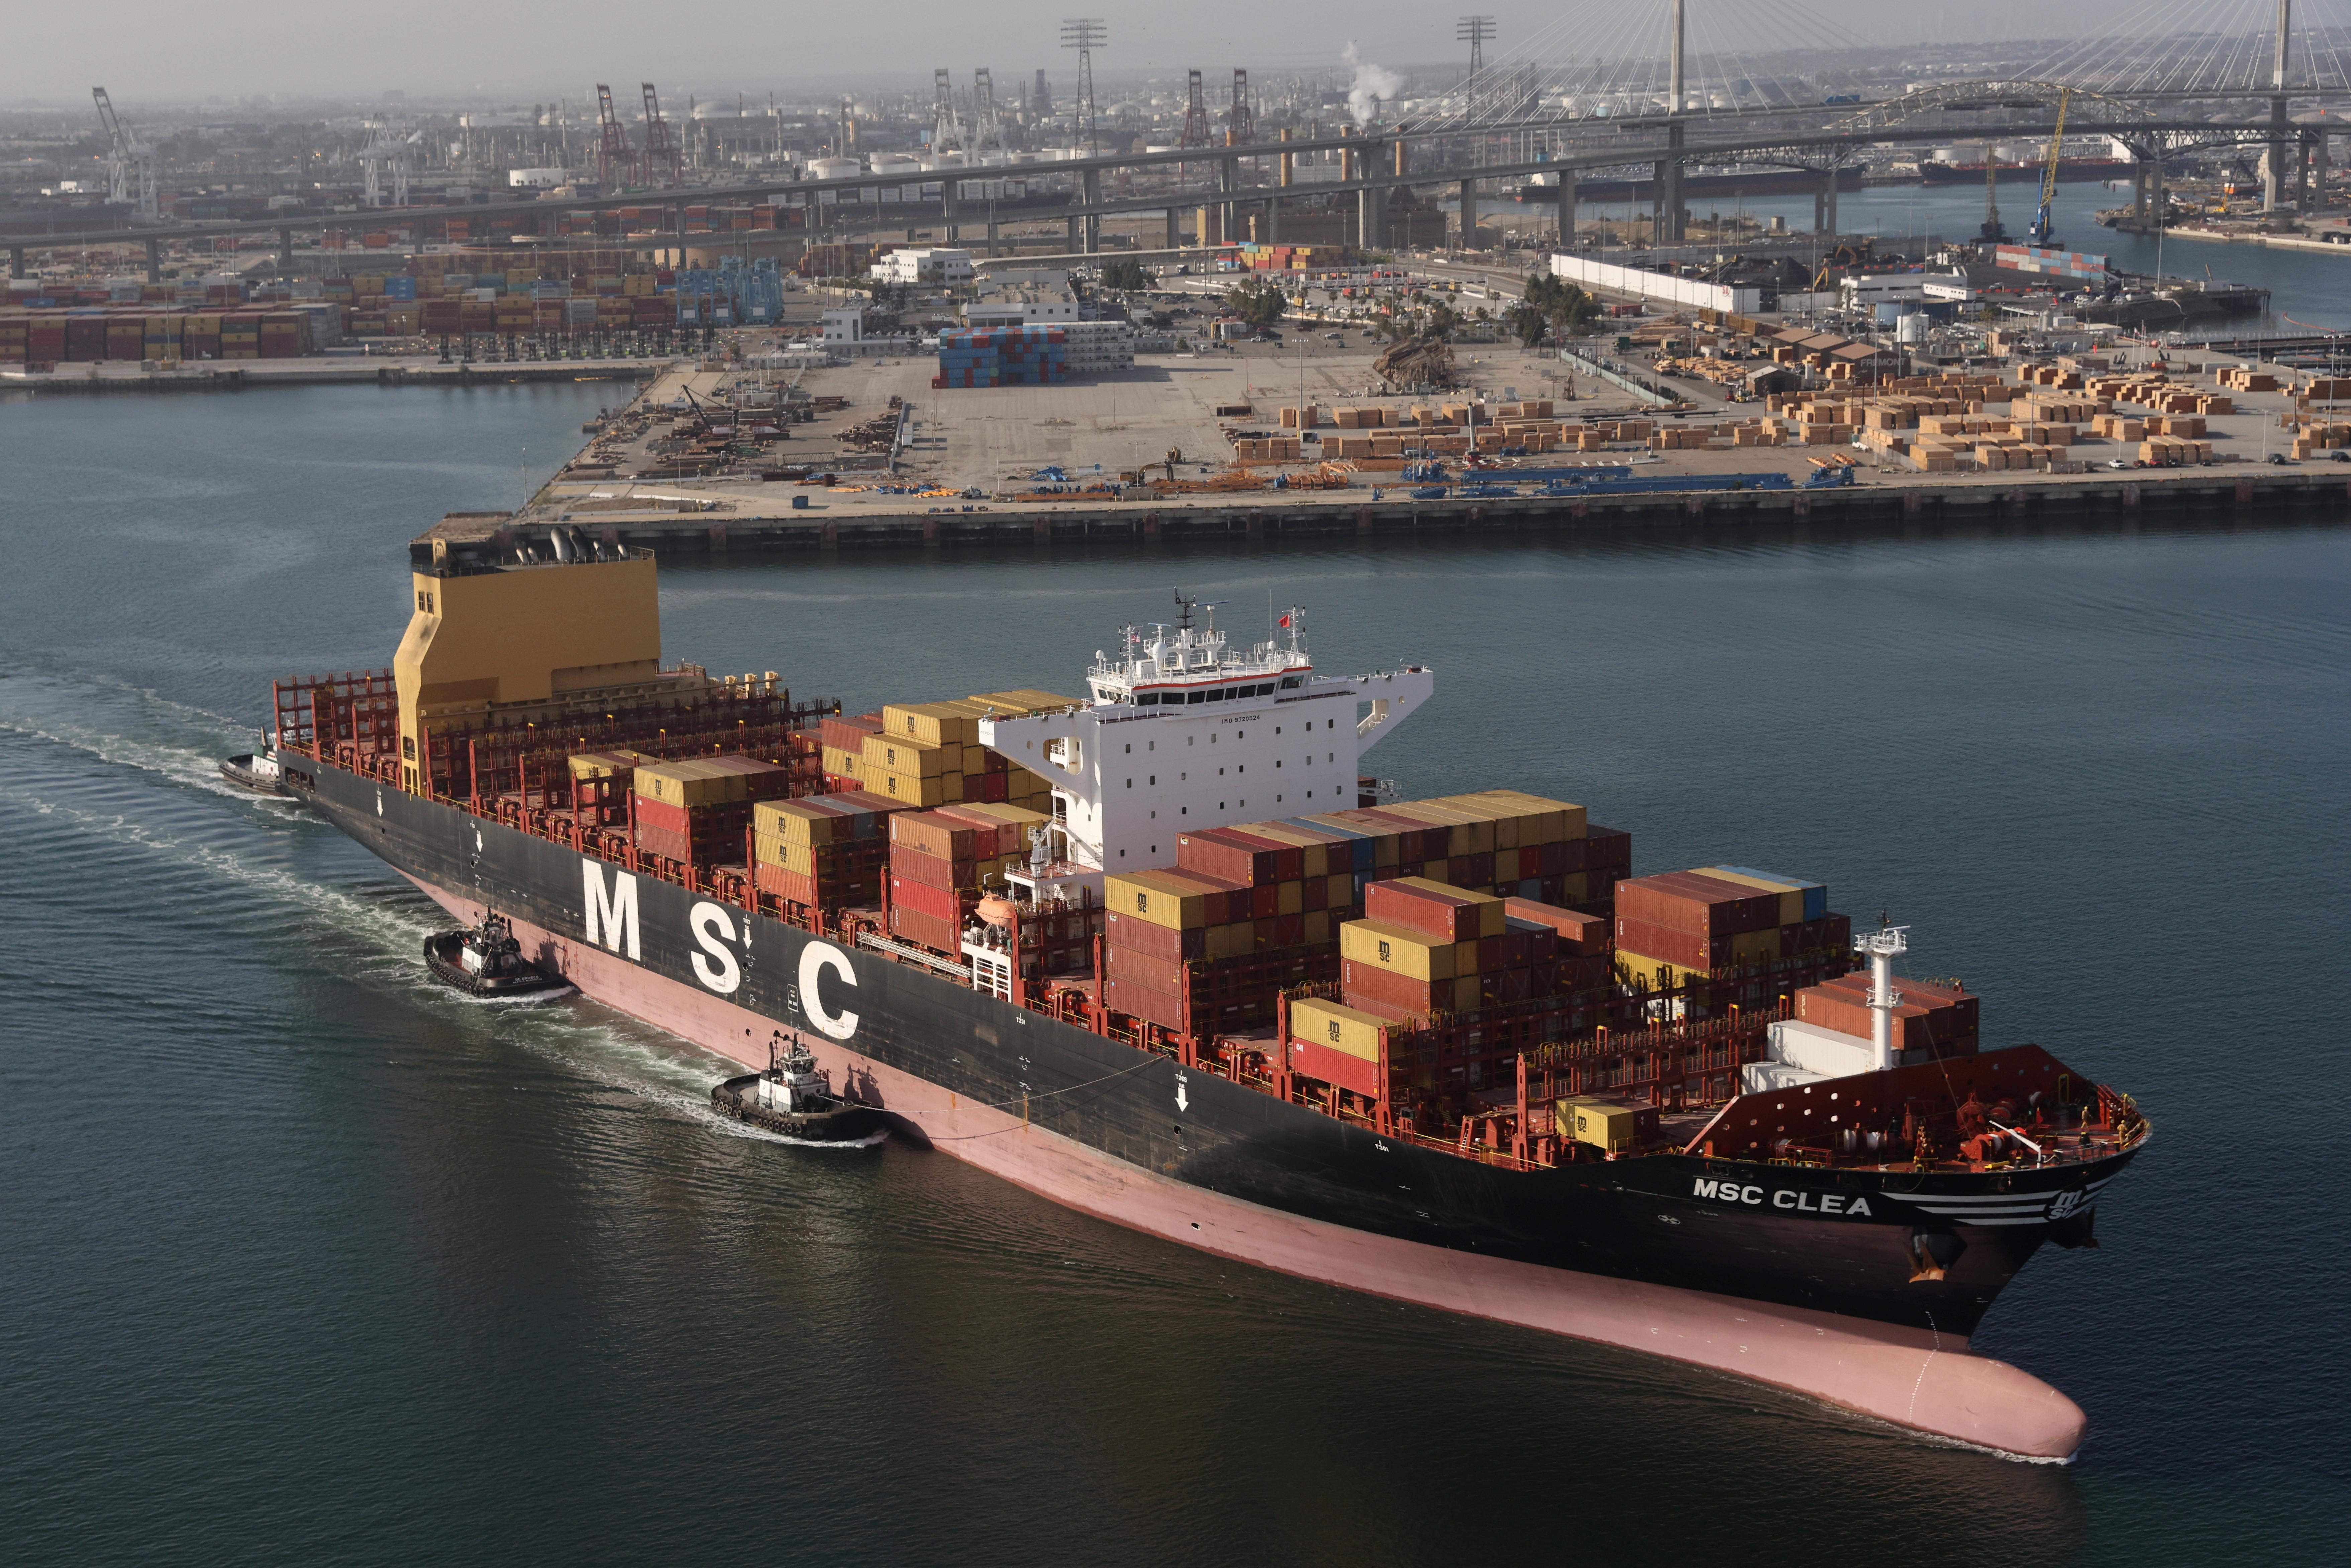 a container ship